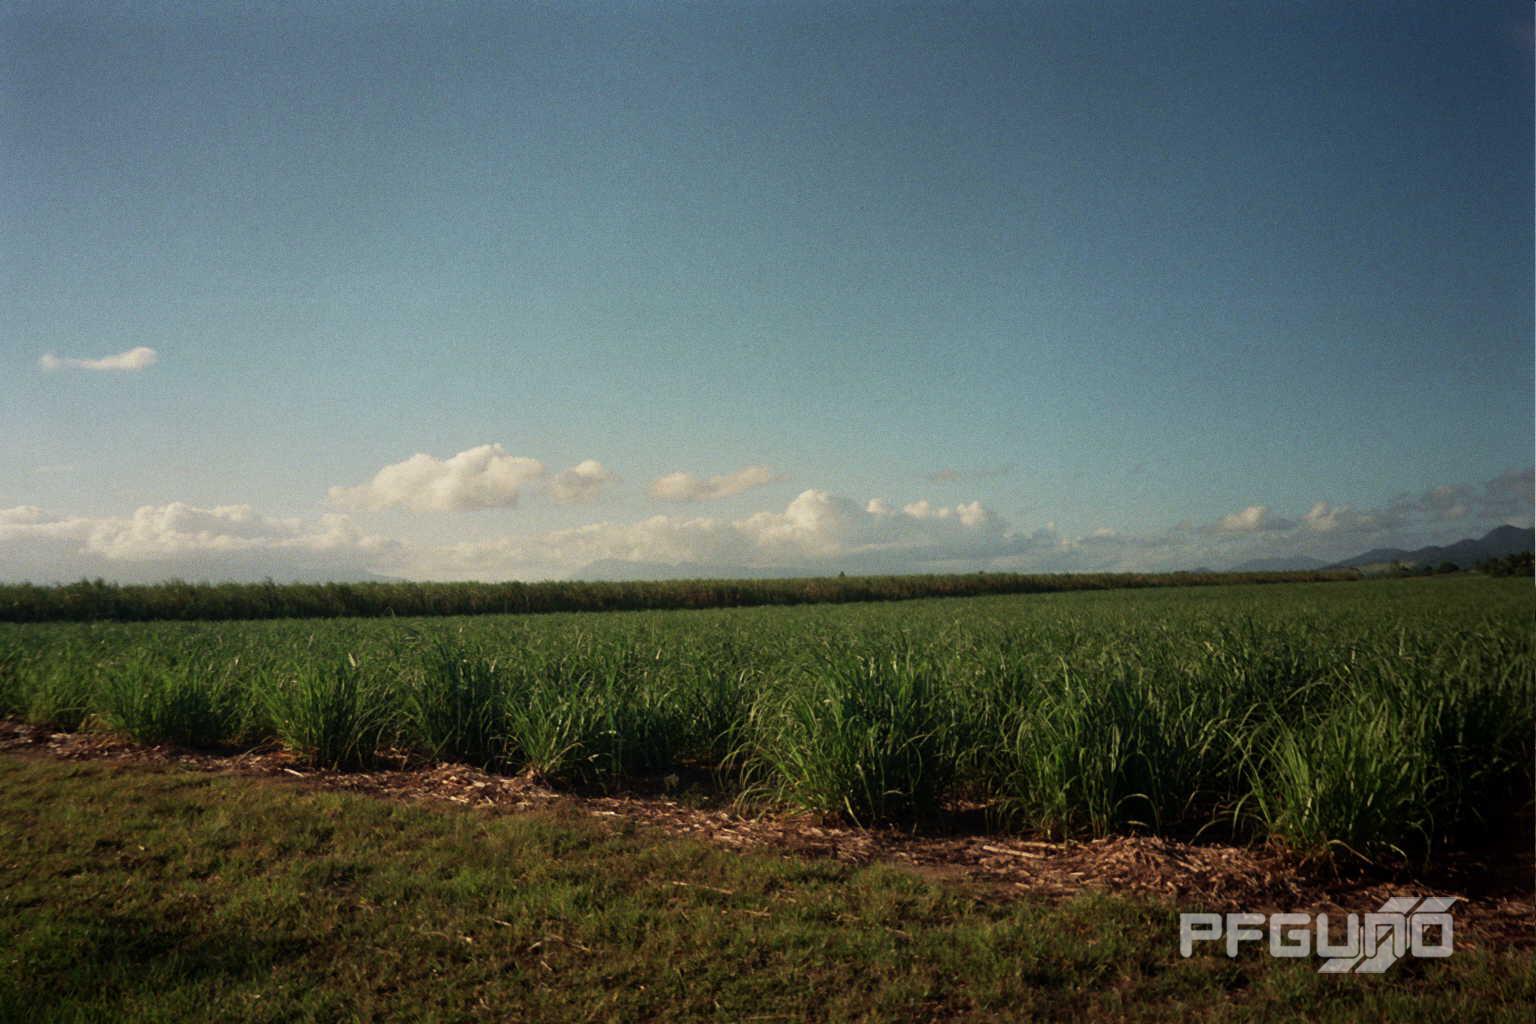 Fields Of Sugarcane